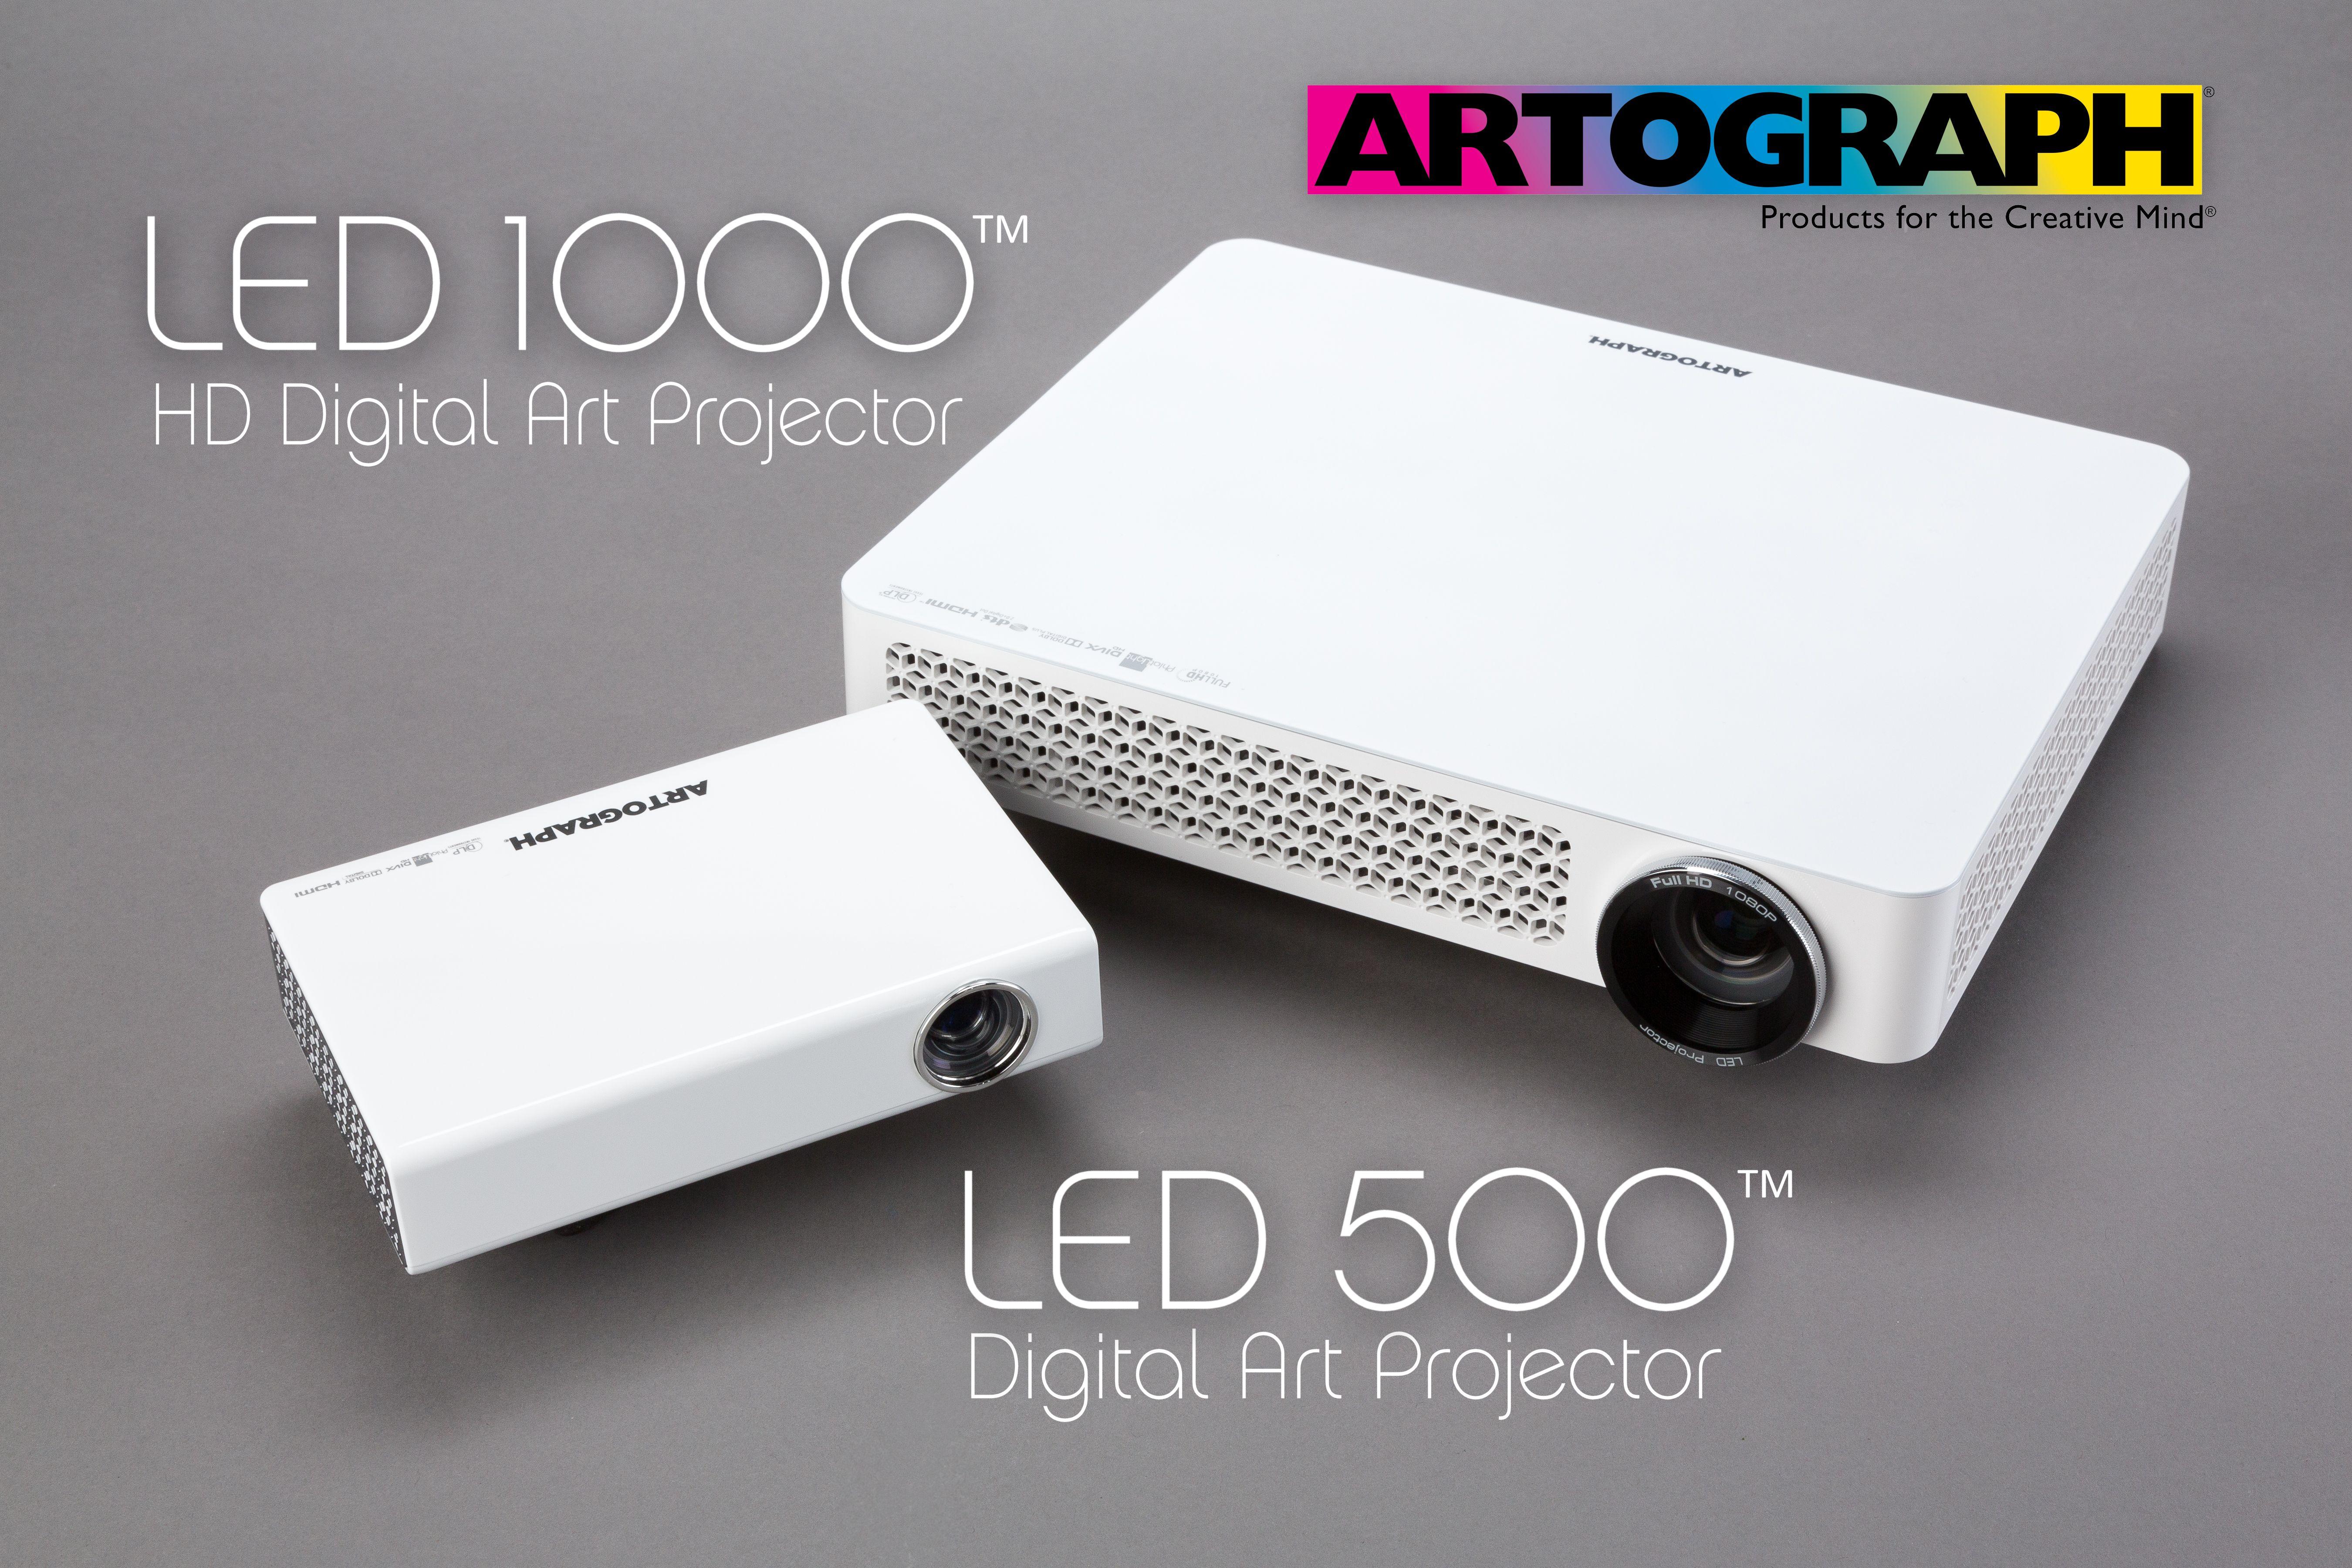 Press Release LED 1000 HD Digital Art Projector